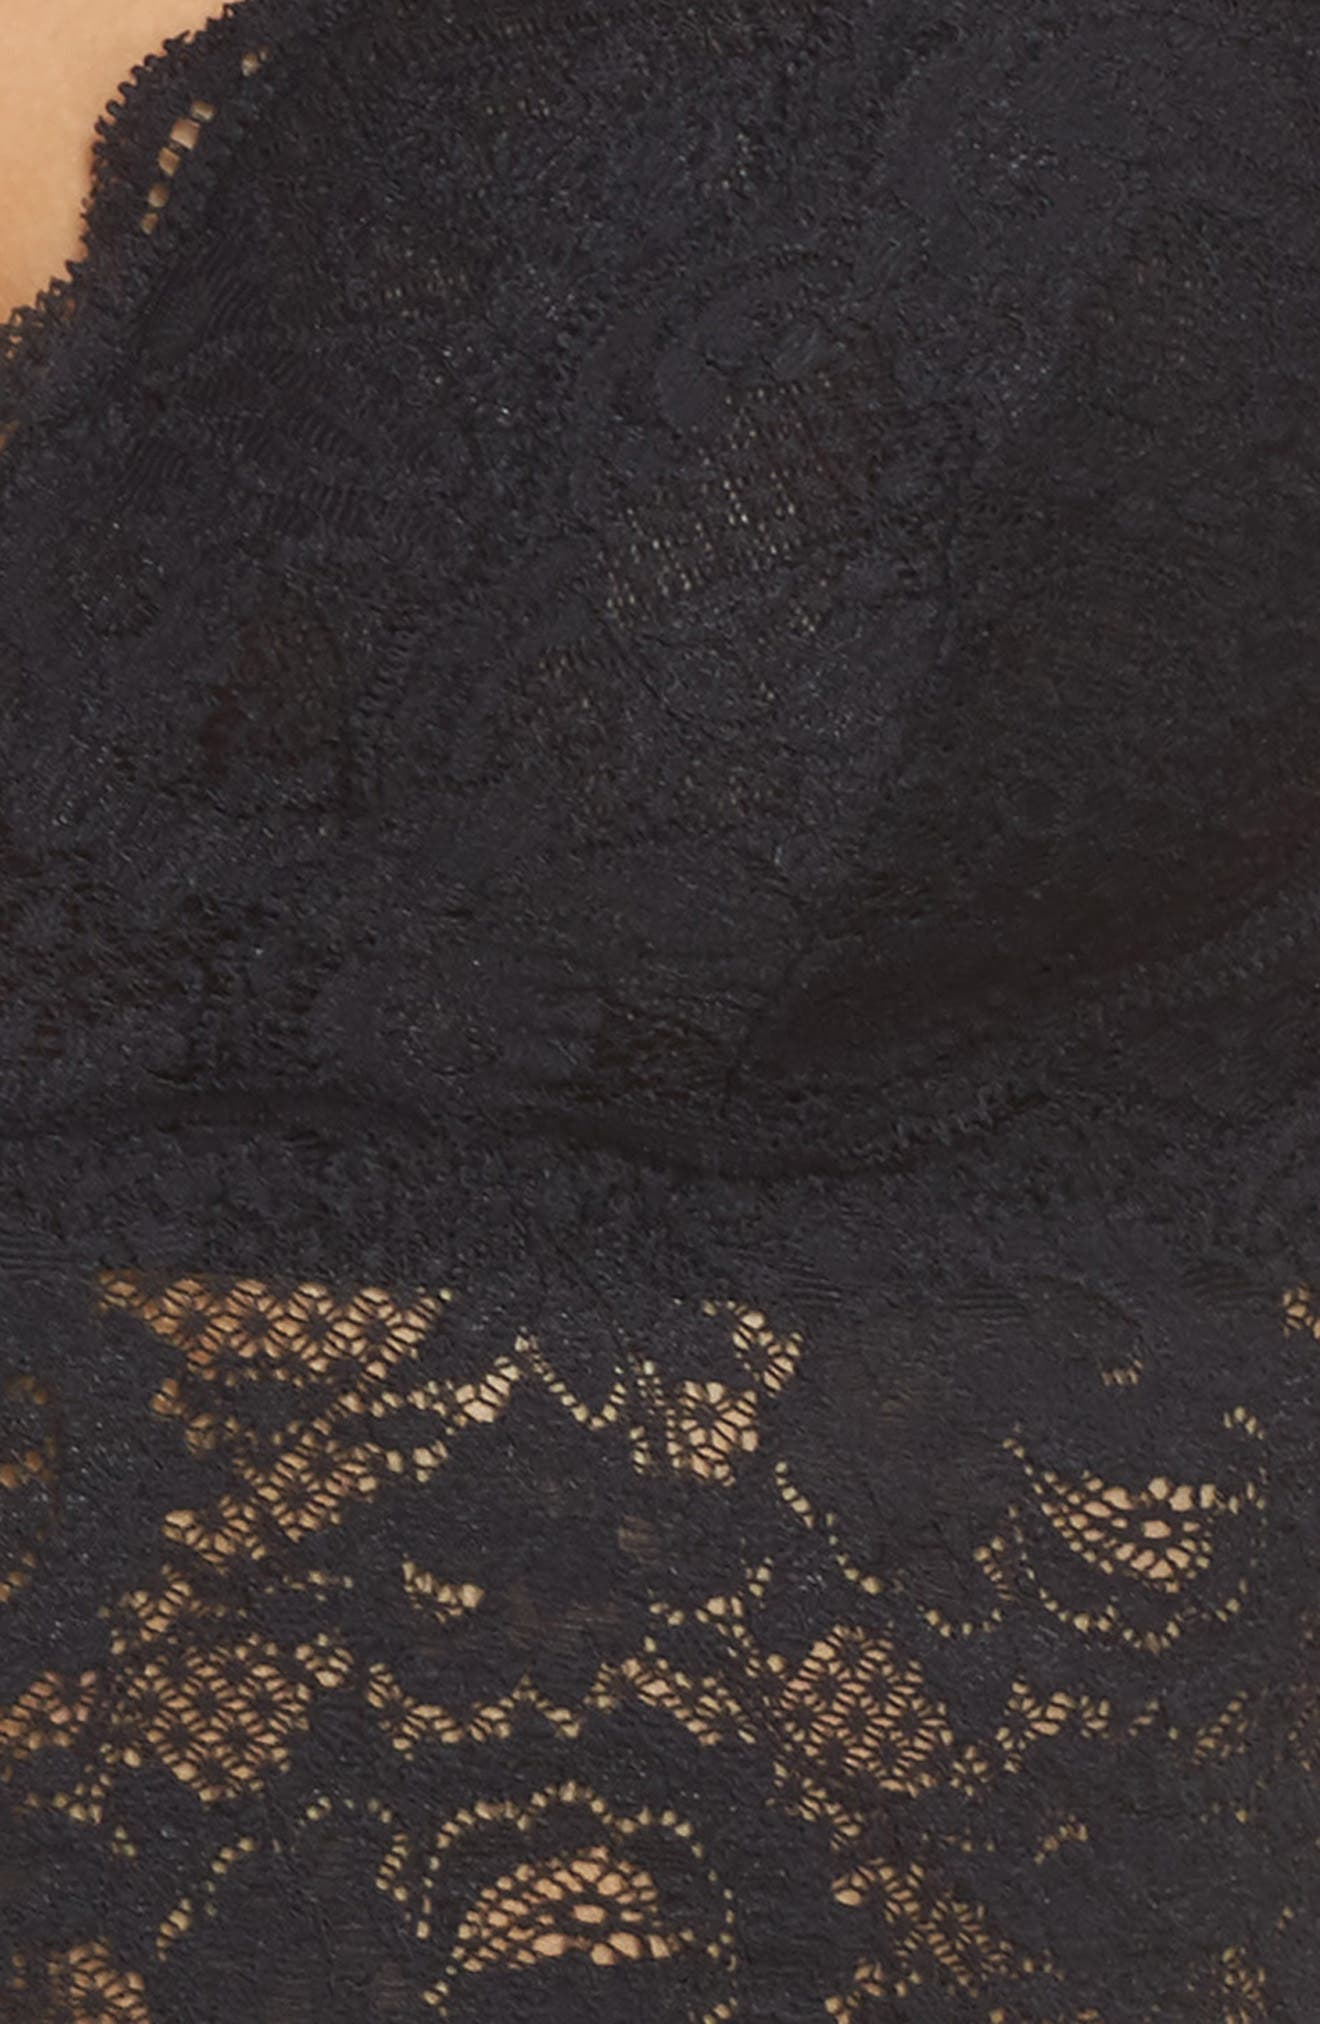 Plunging Lace Bralette,                             Alternate thumbnail 4, color,                             001